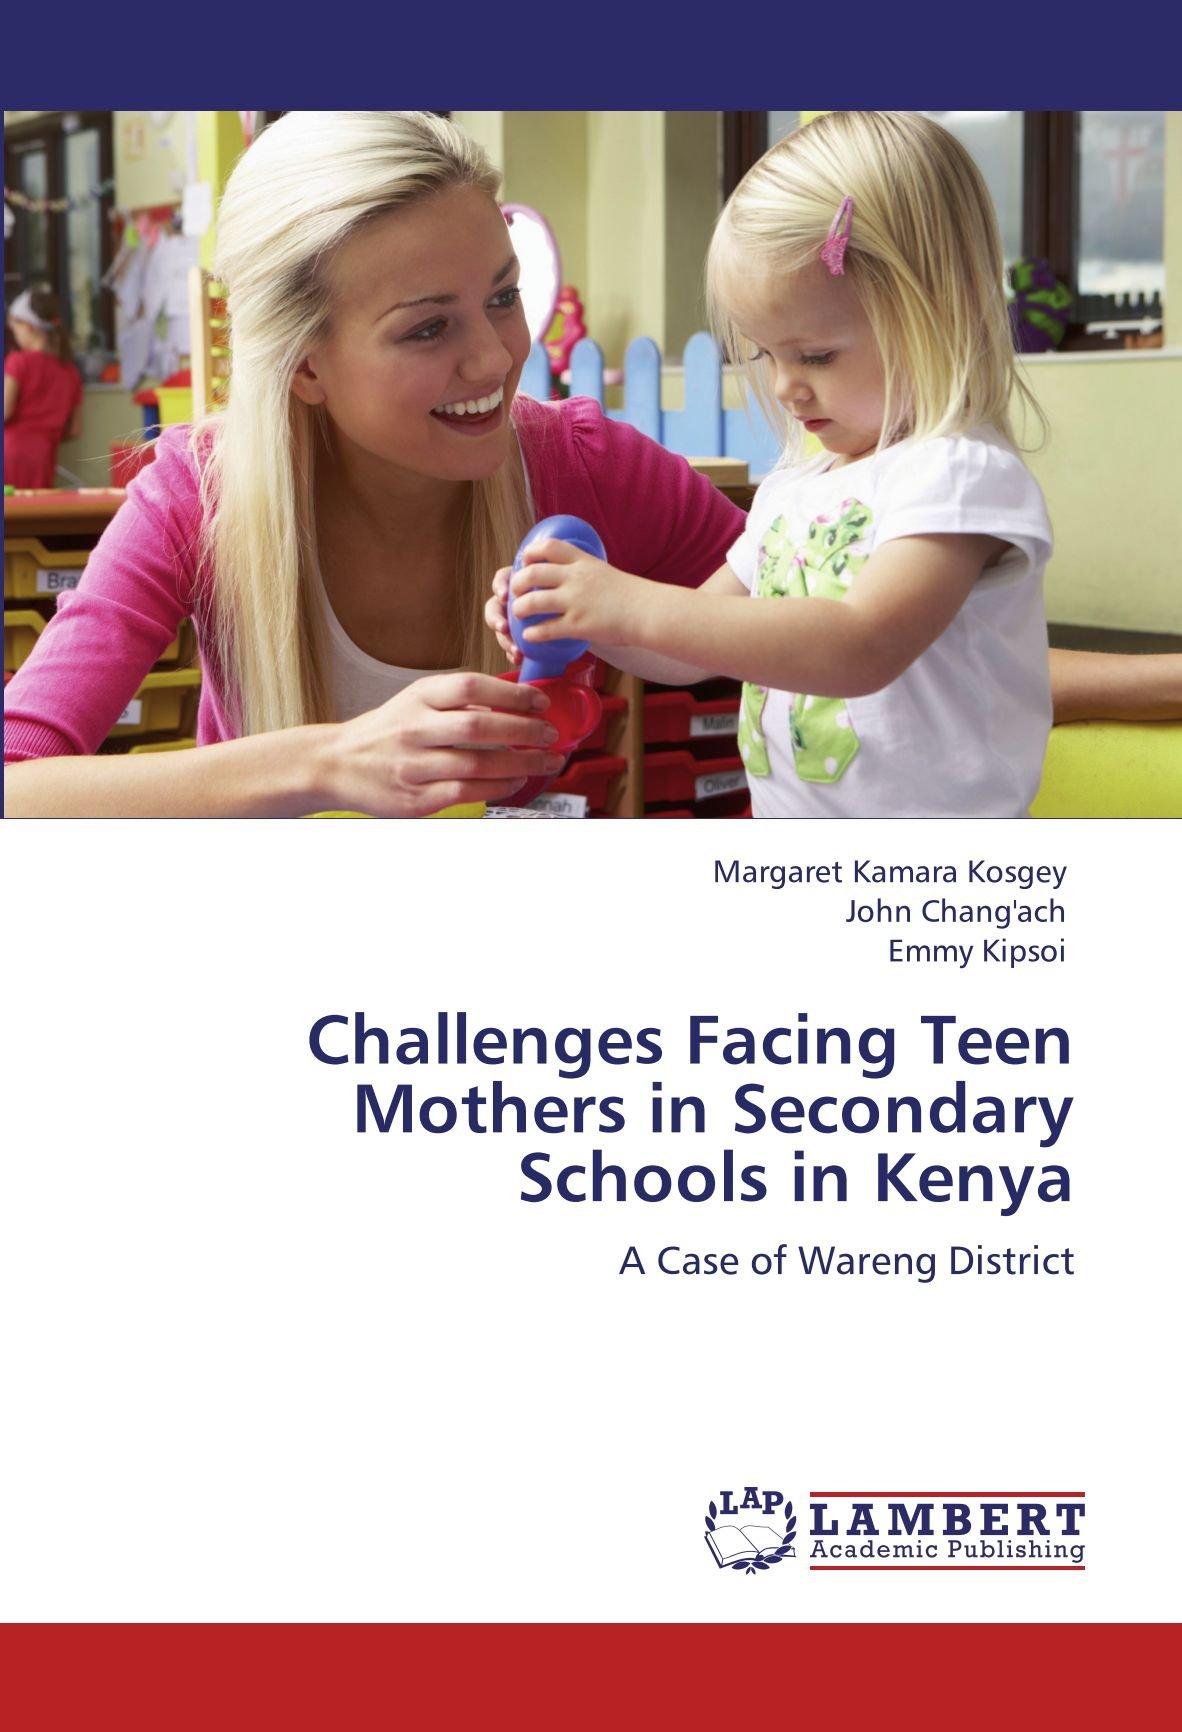 Download Challenges Facing Teen Mothers in Secondary Schools in Kenya: A Case of Wareng District ebook